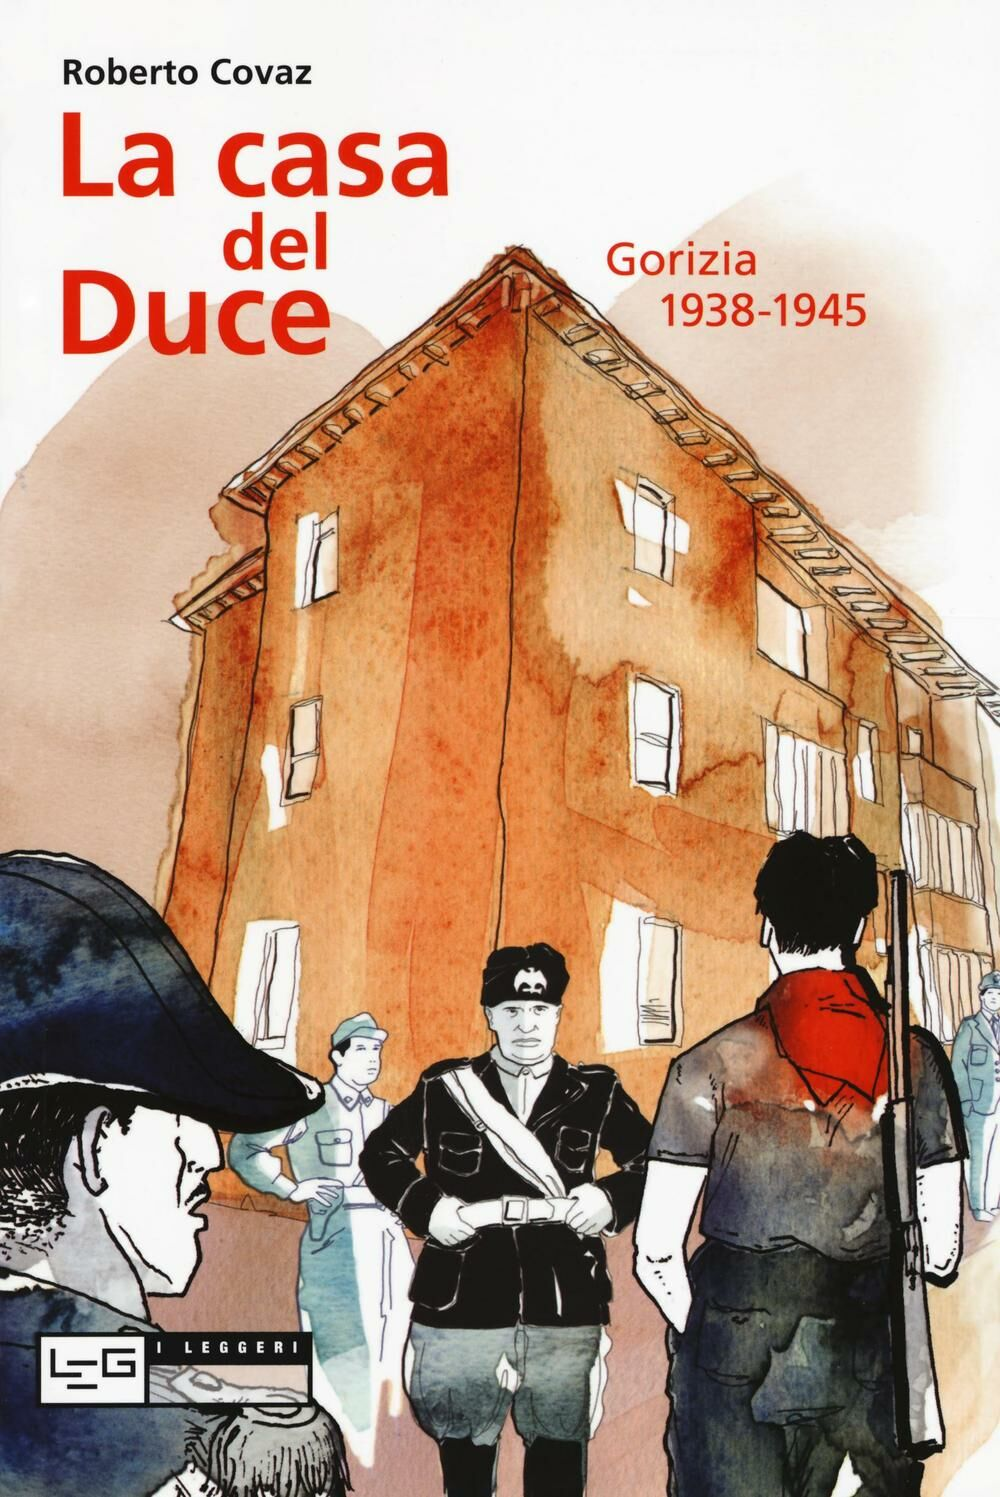 La casa del duce. Gorizia 1938-1945